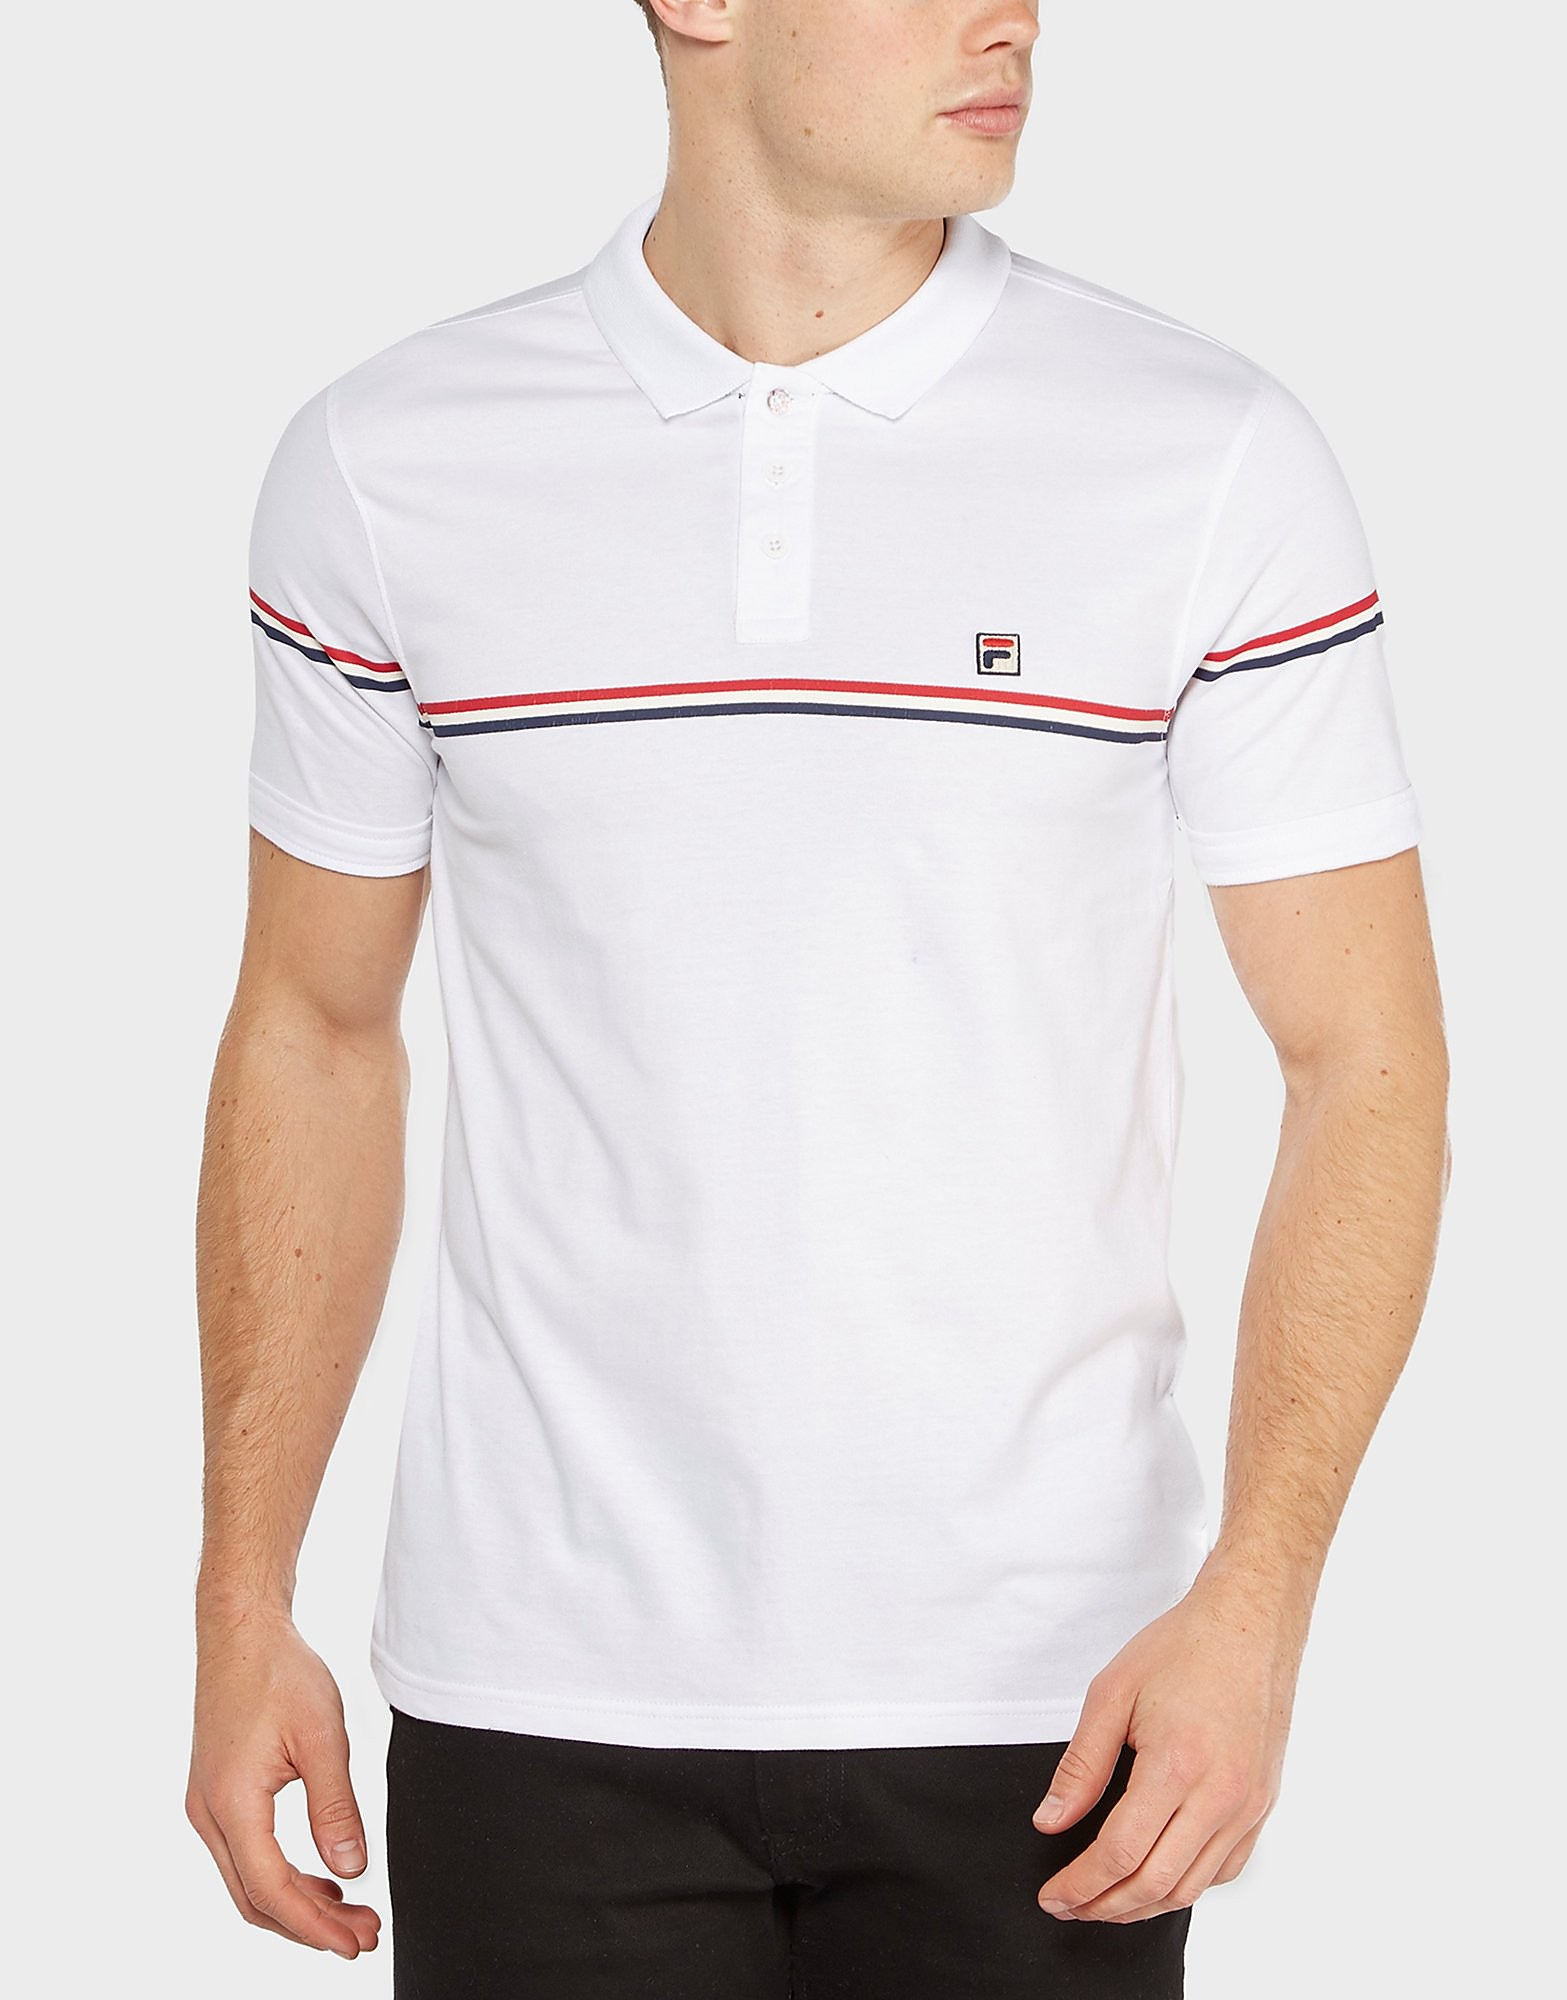 Fila Martelli Polo Shirt